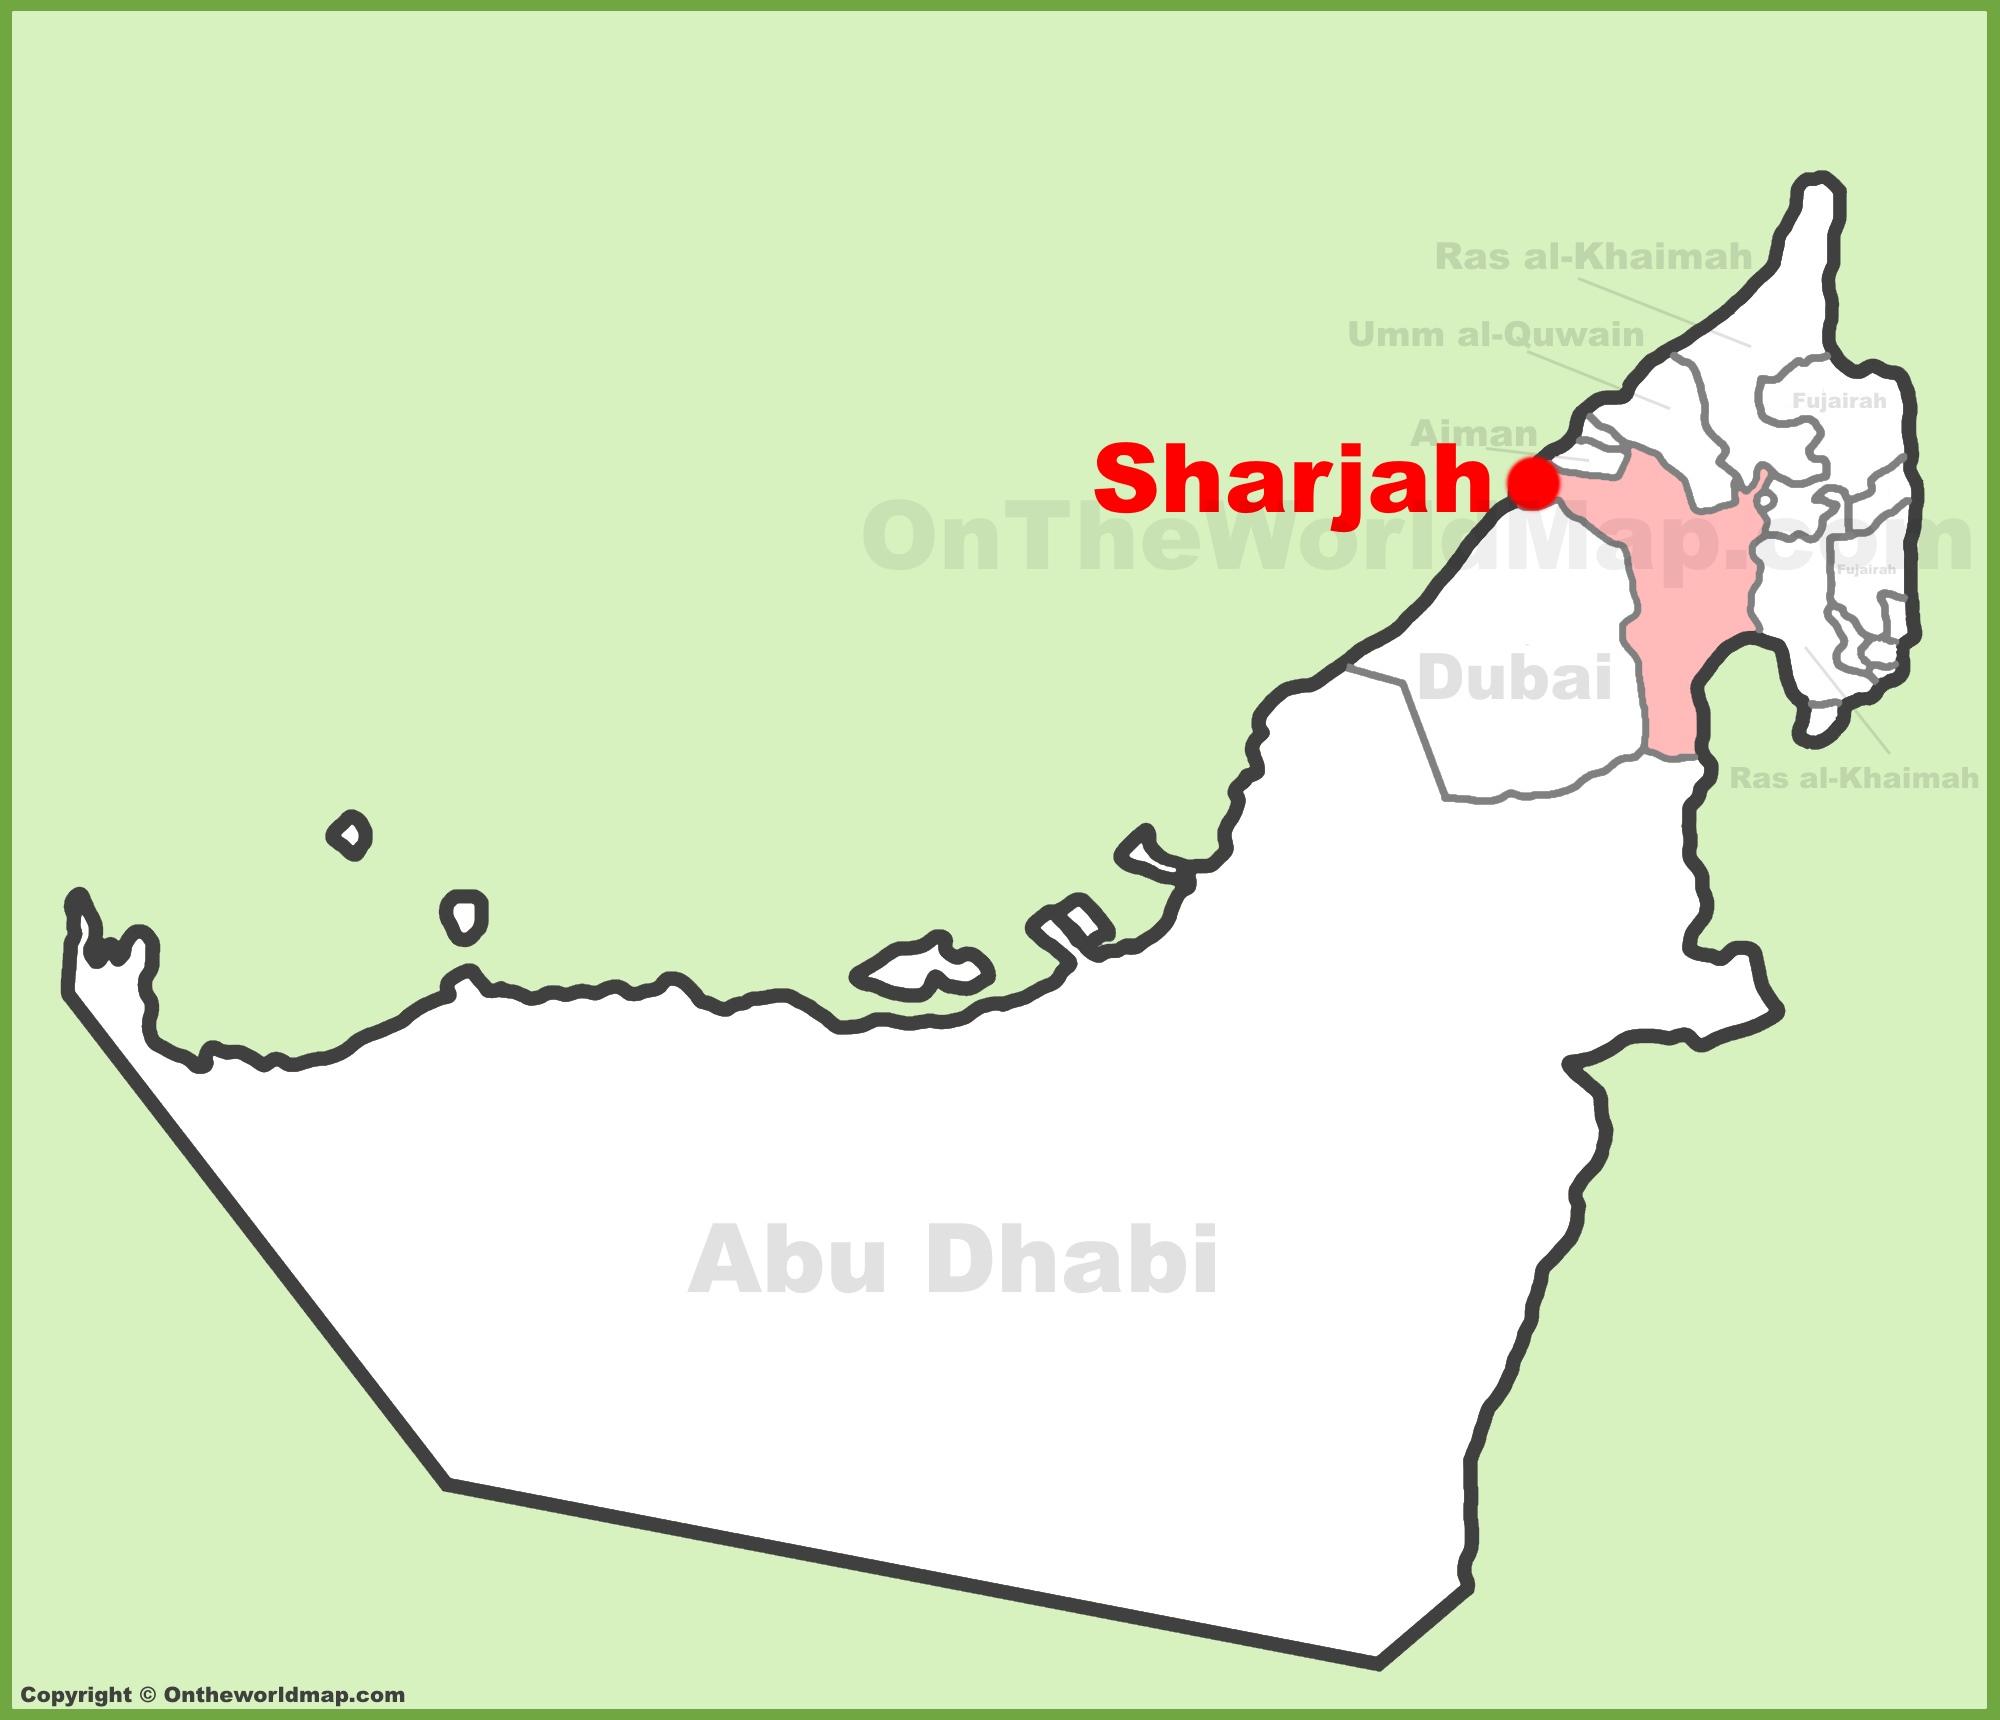 Sharjah location on the UAE United Arab Emirates Map